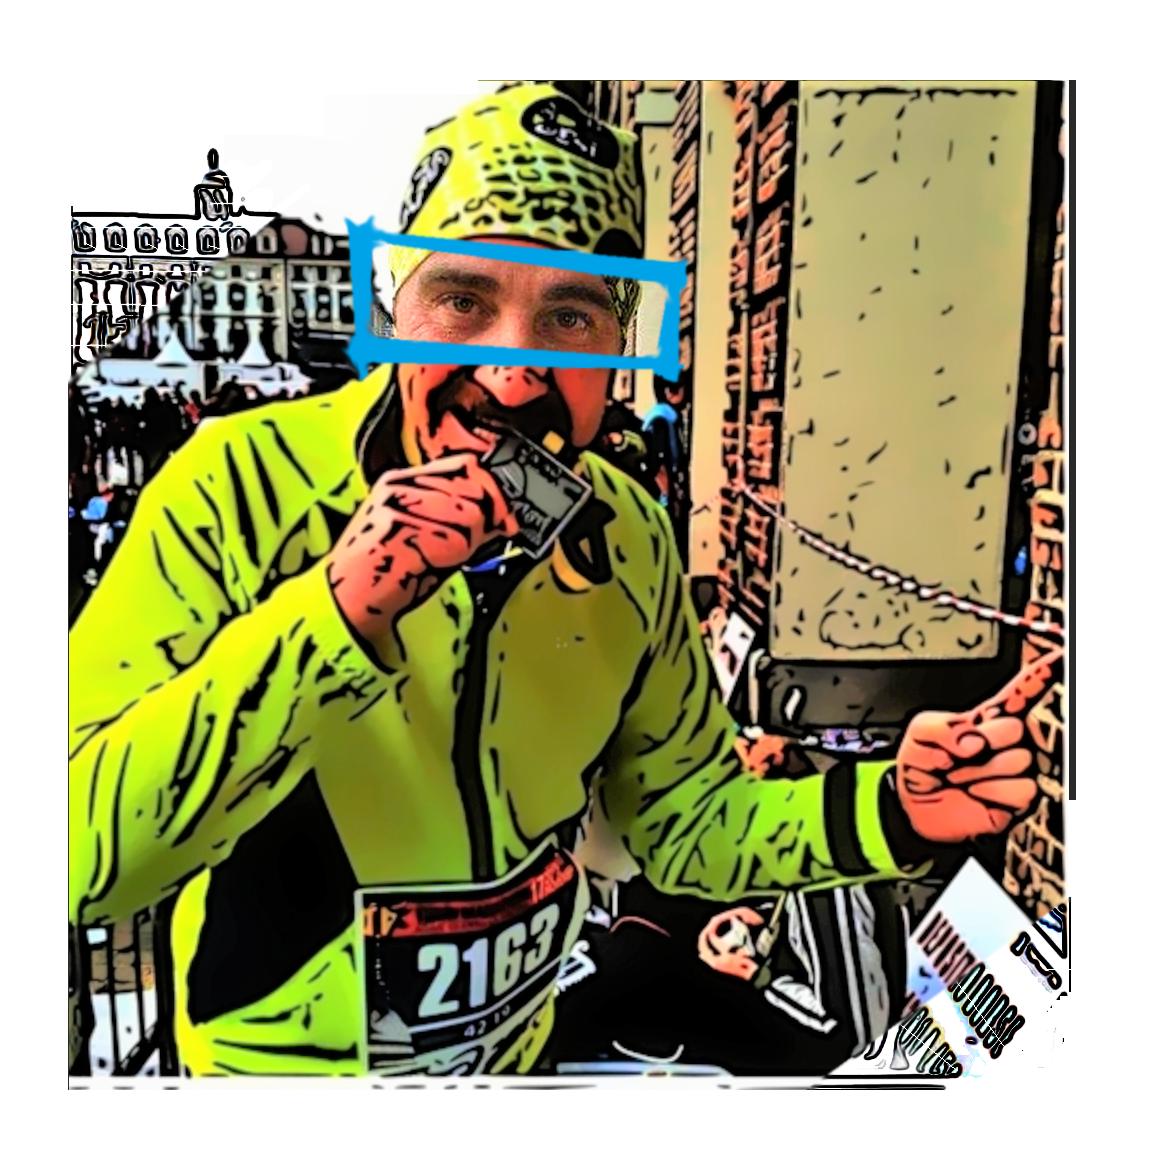 arrivo maratona di torino